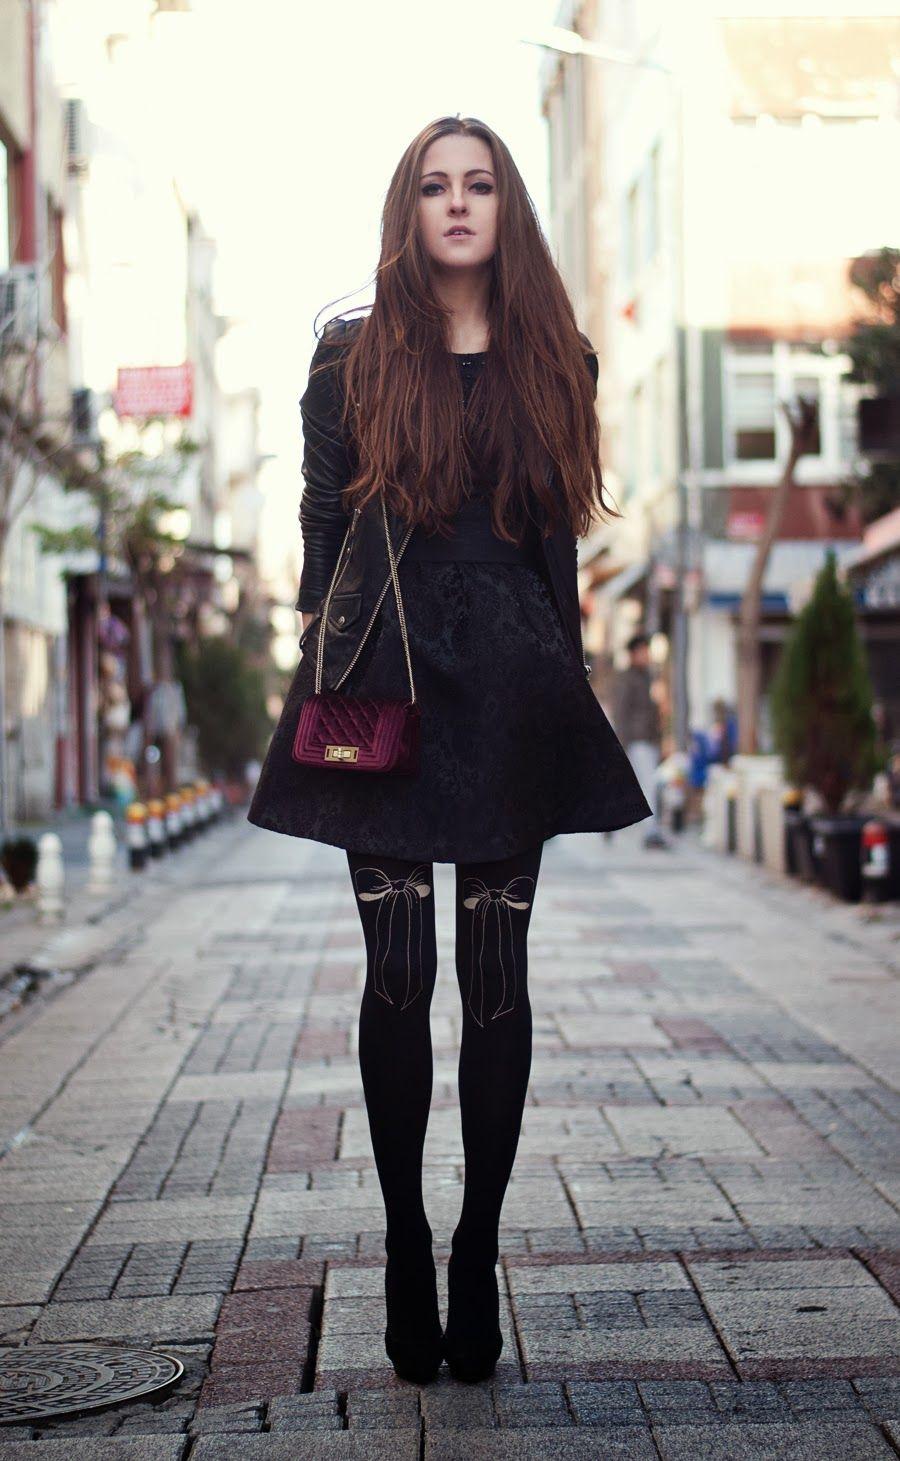 pattern black tights with black dress - HD900×1461